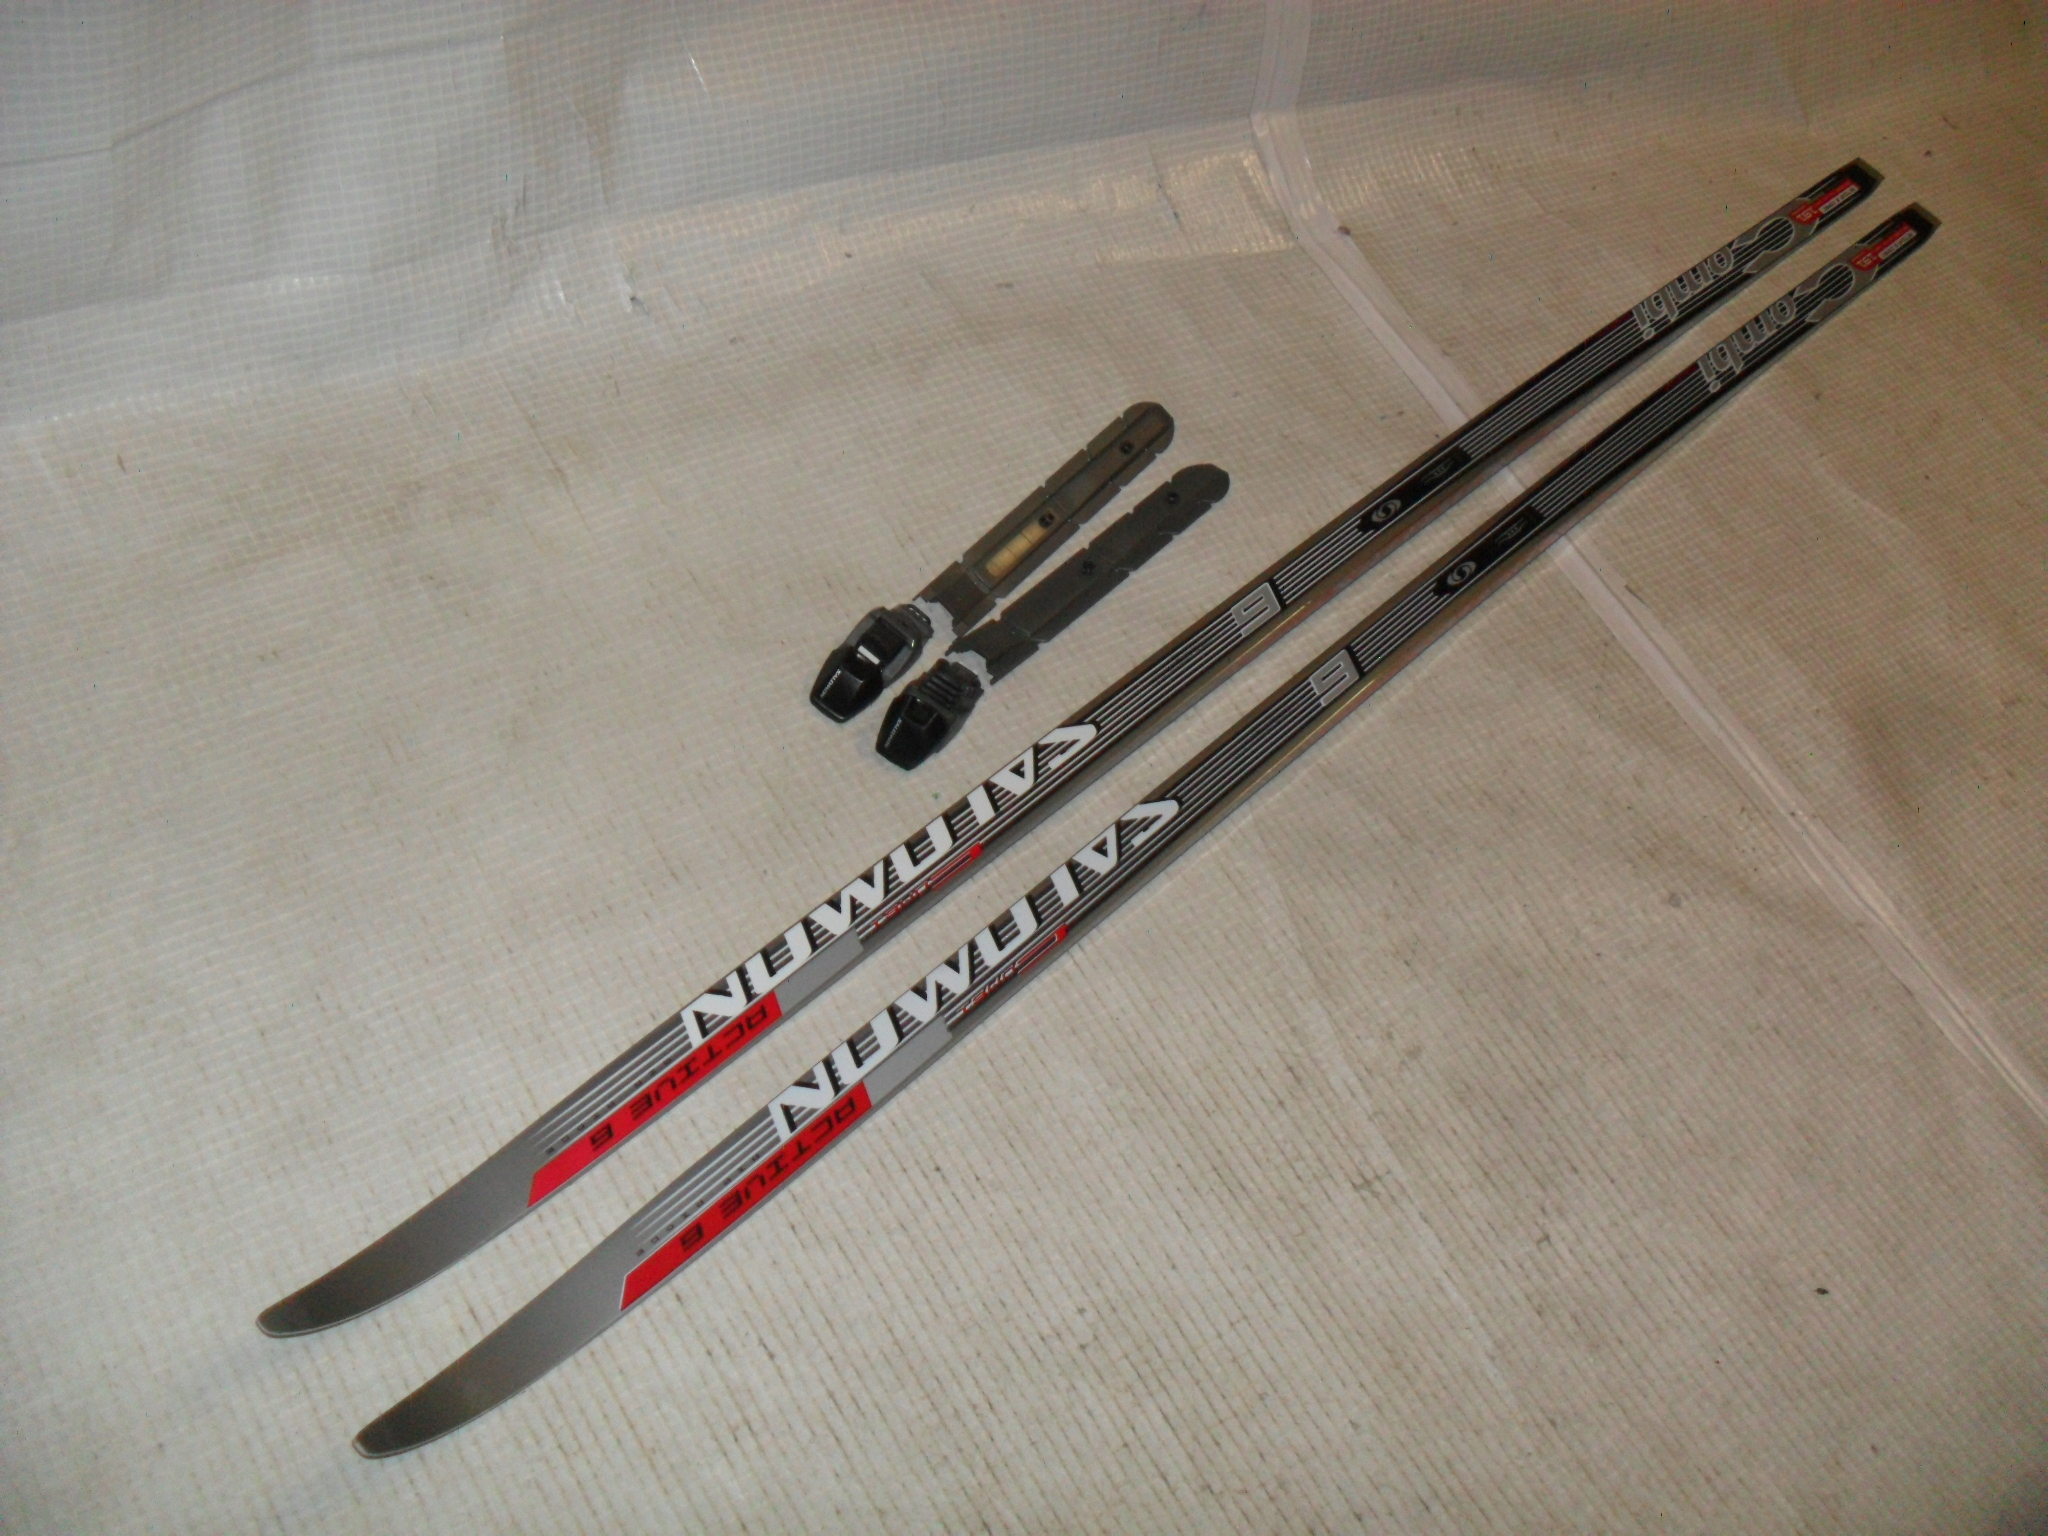 narty biegowe Salomon Active 6 combi 191+ wiązani